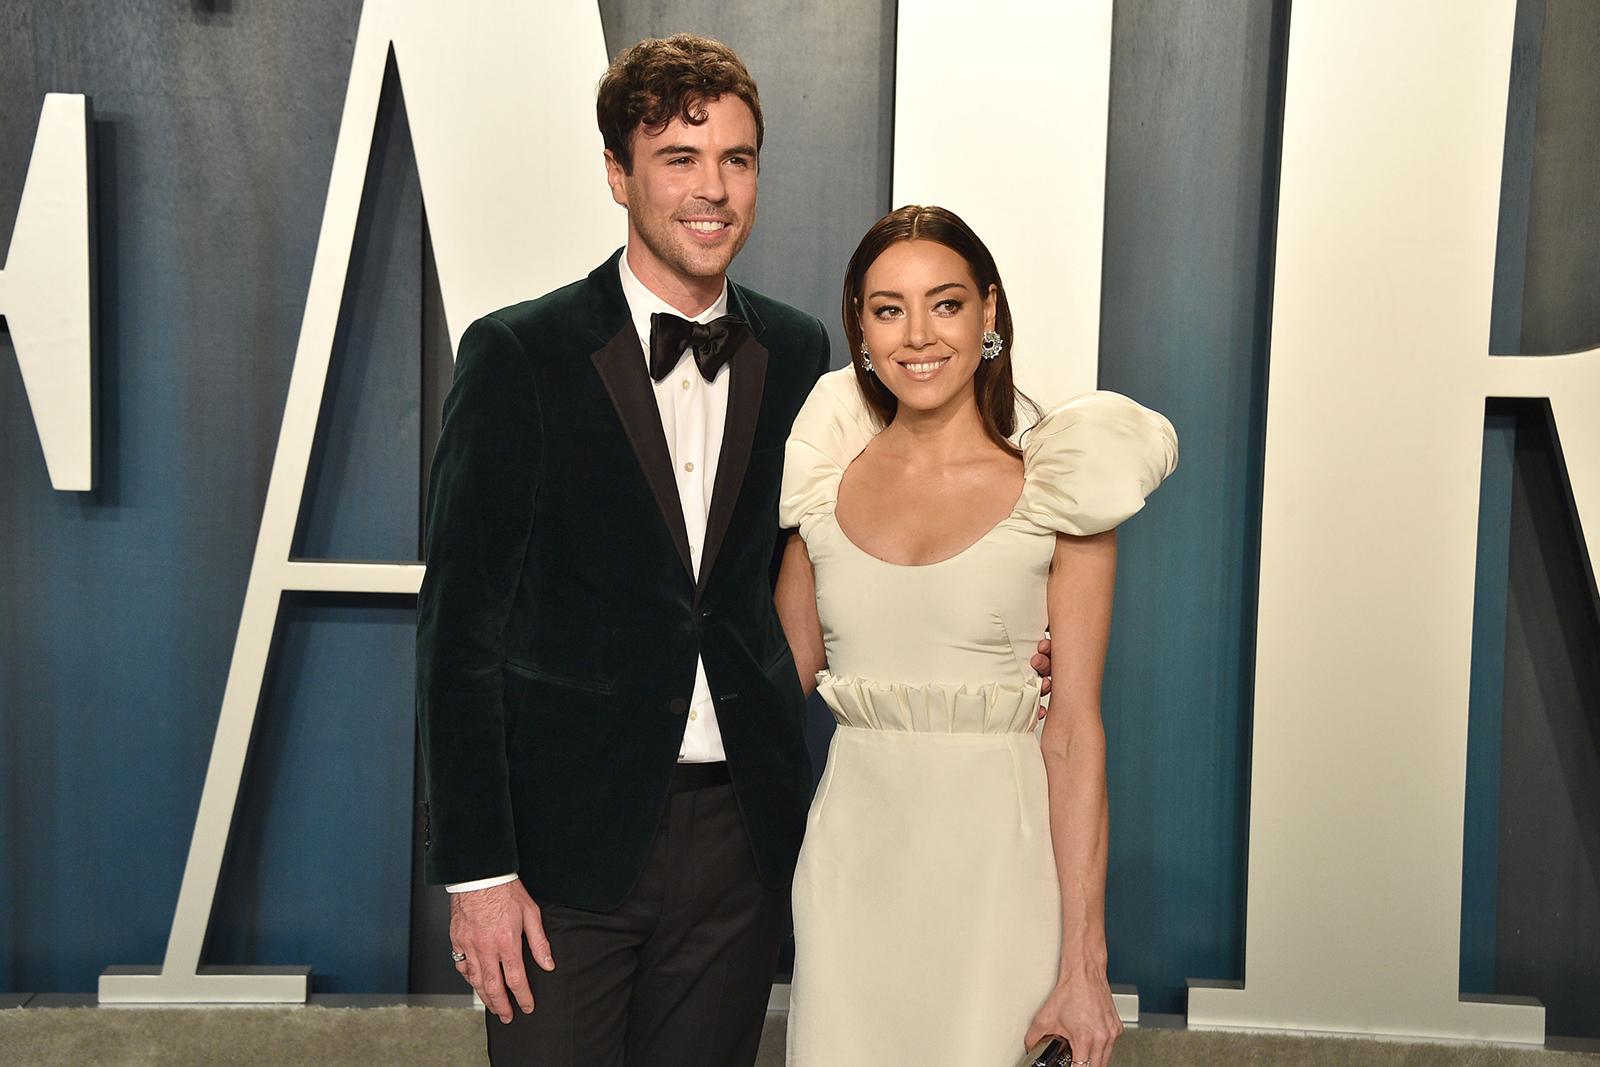 Aubrey Plaza has married her longtime boyfriend, director Jeff Baena